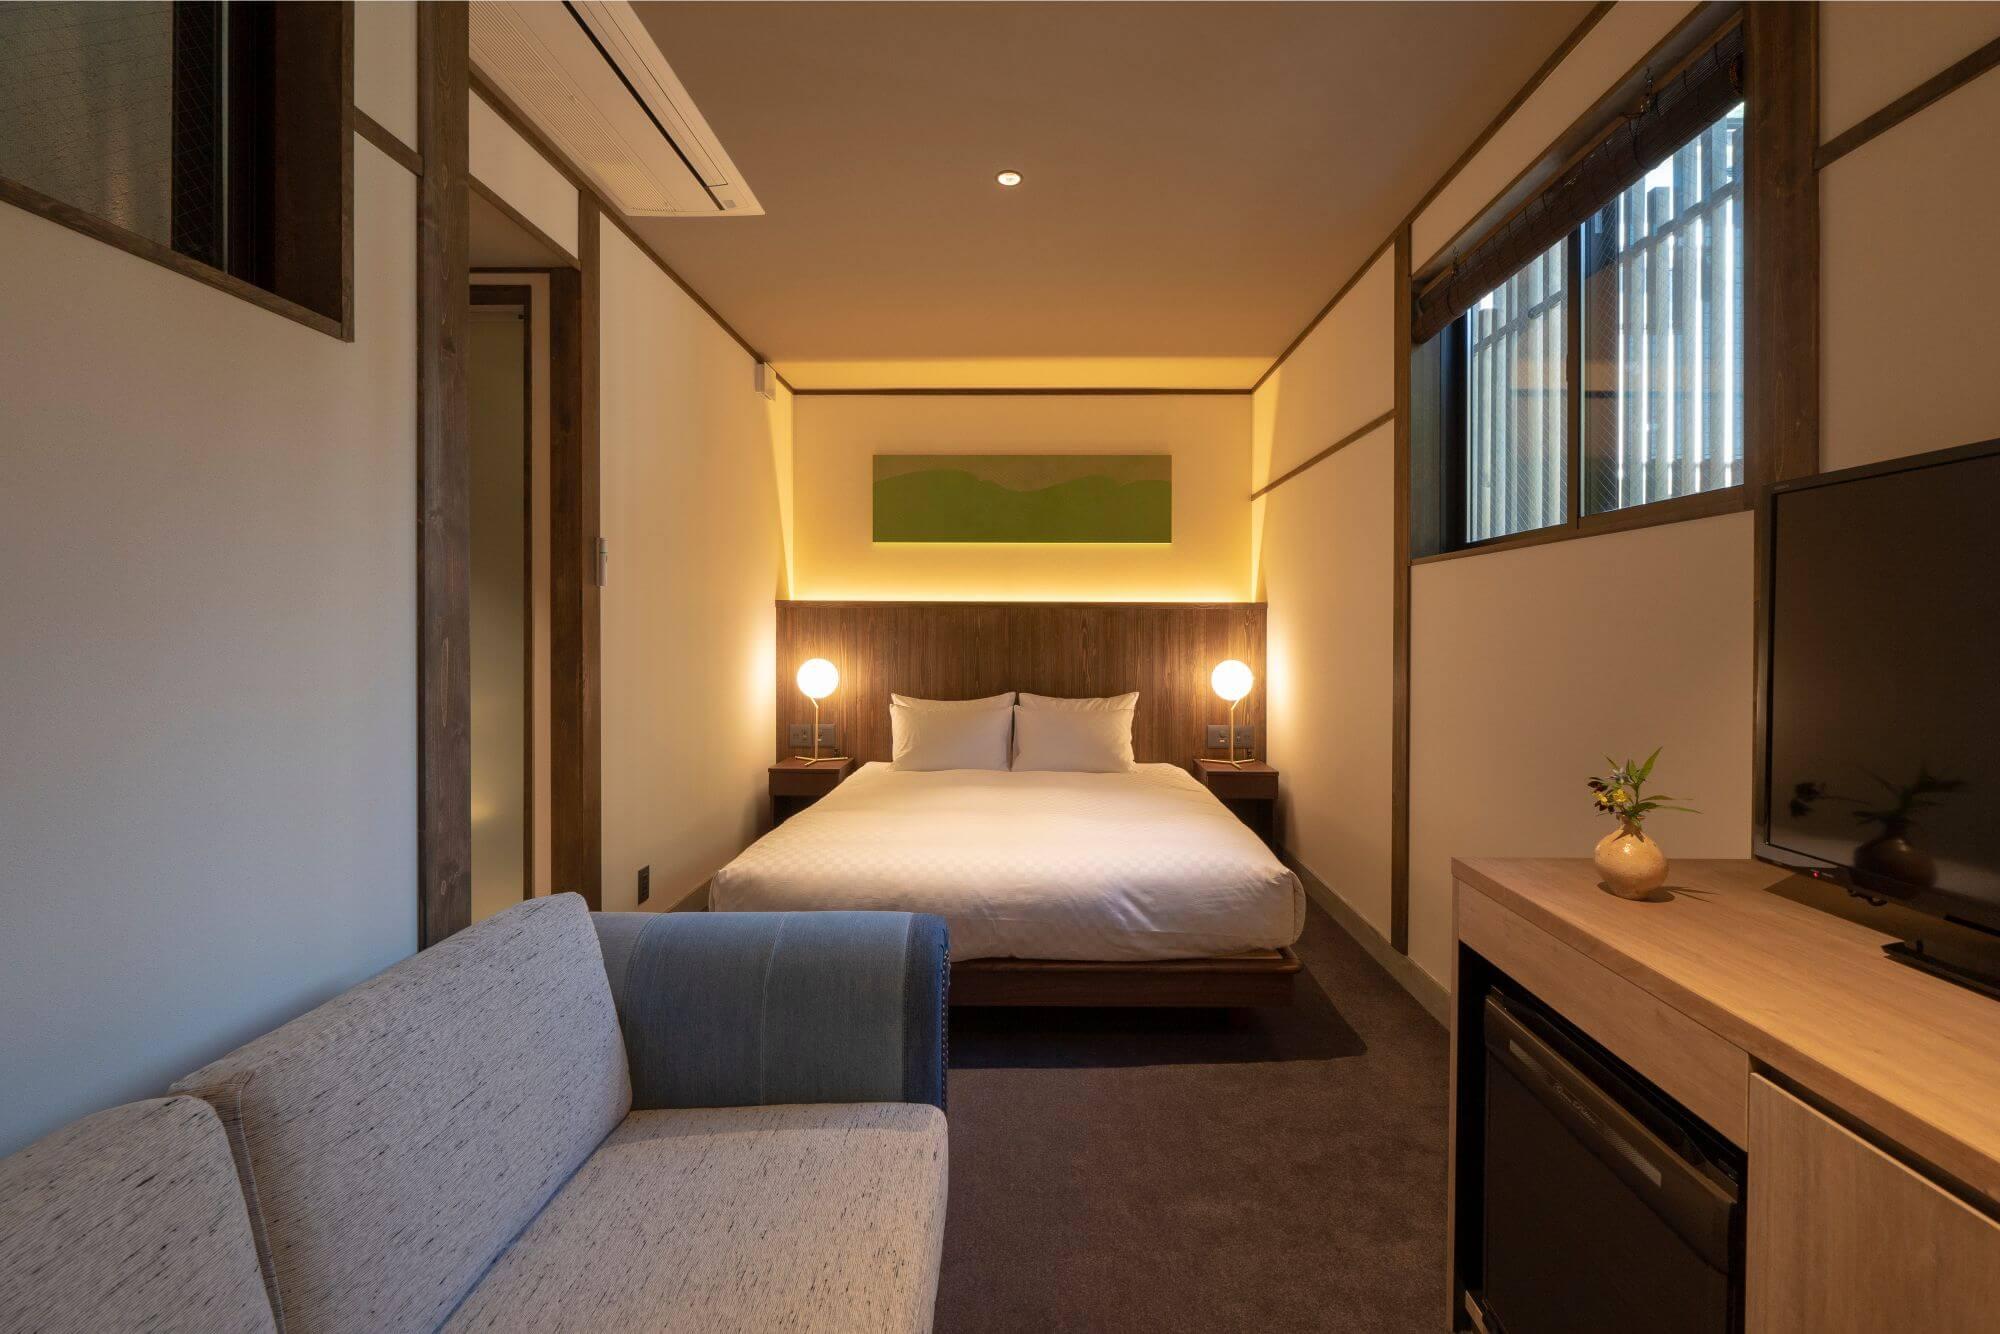 101)KAZE Deluxe Room